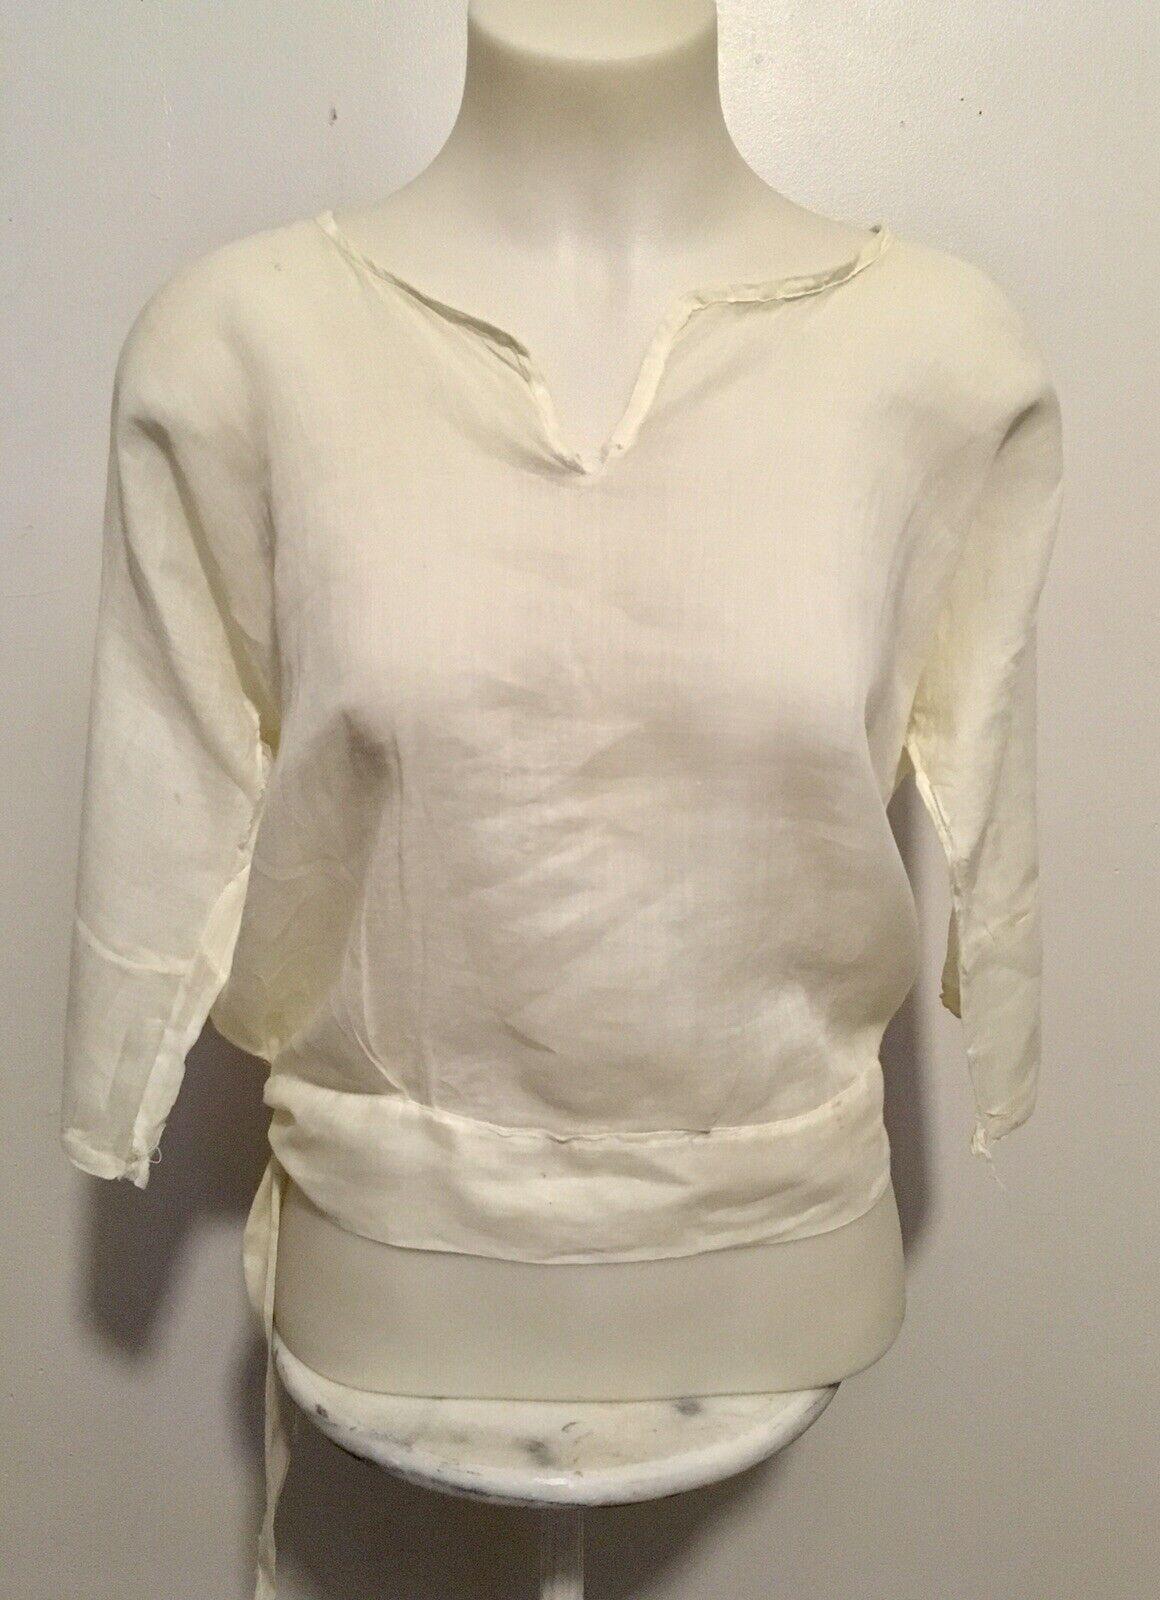 Antique Edwardian Victorian Shirtwaist Blouse - image 2